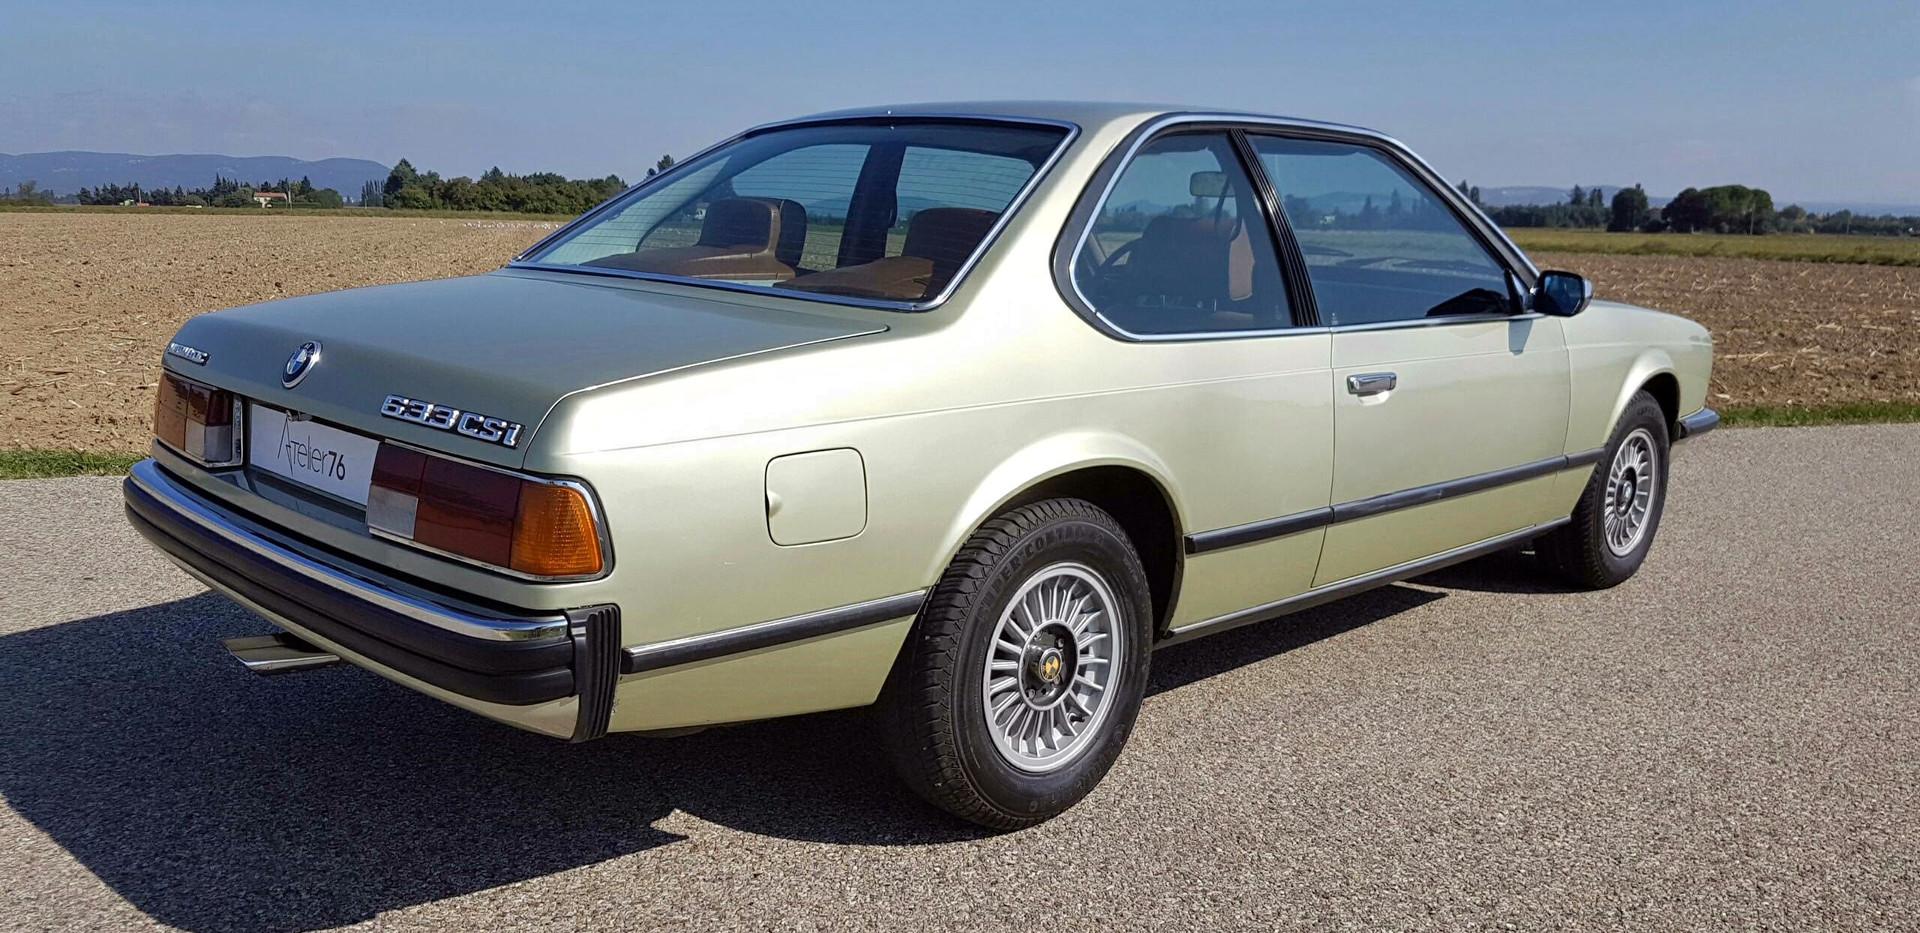 BMW 633 CSi